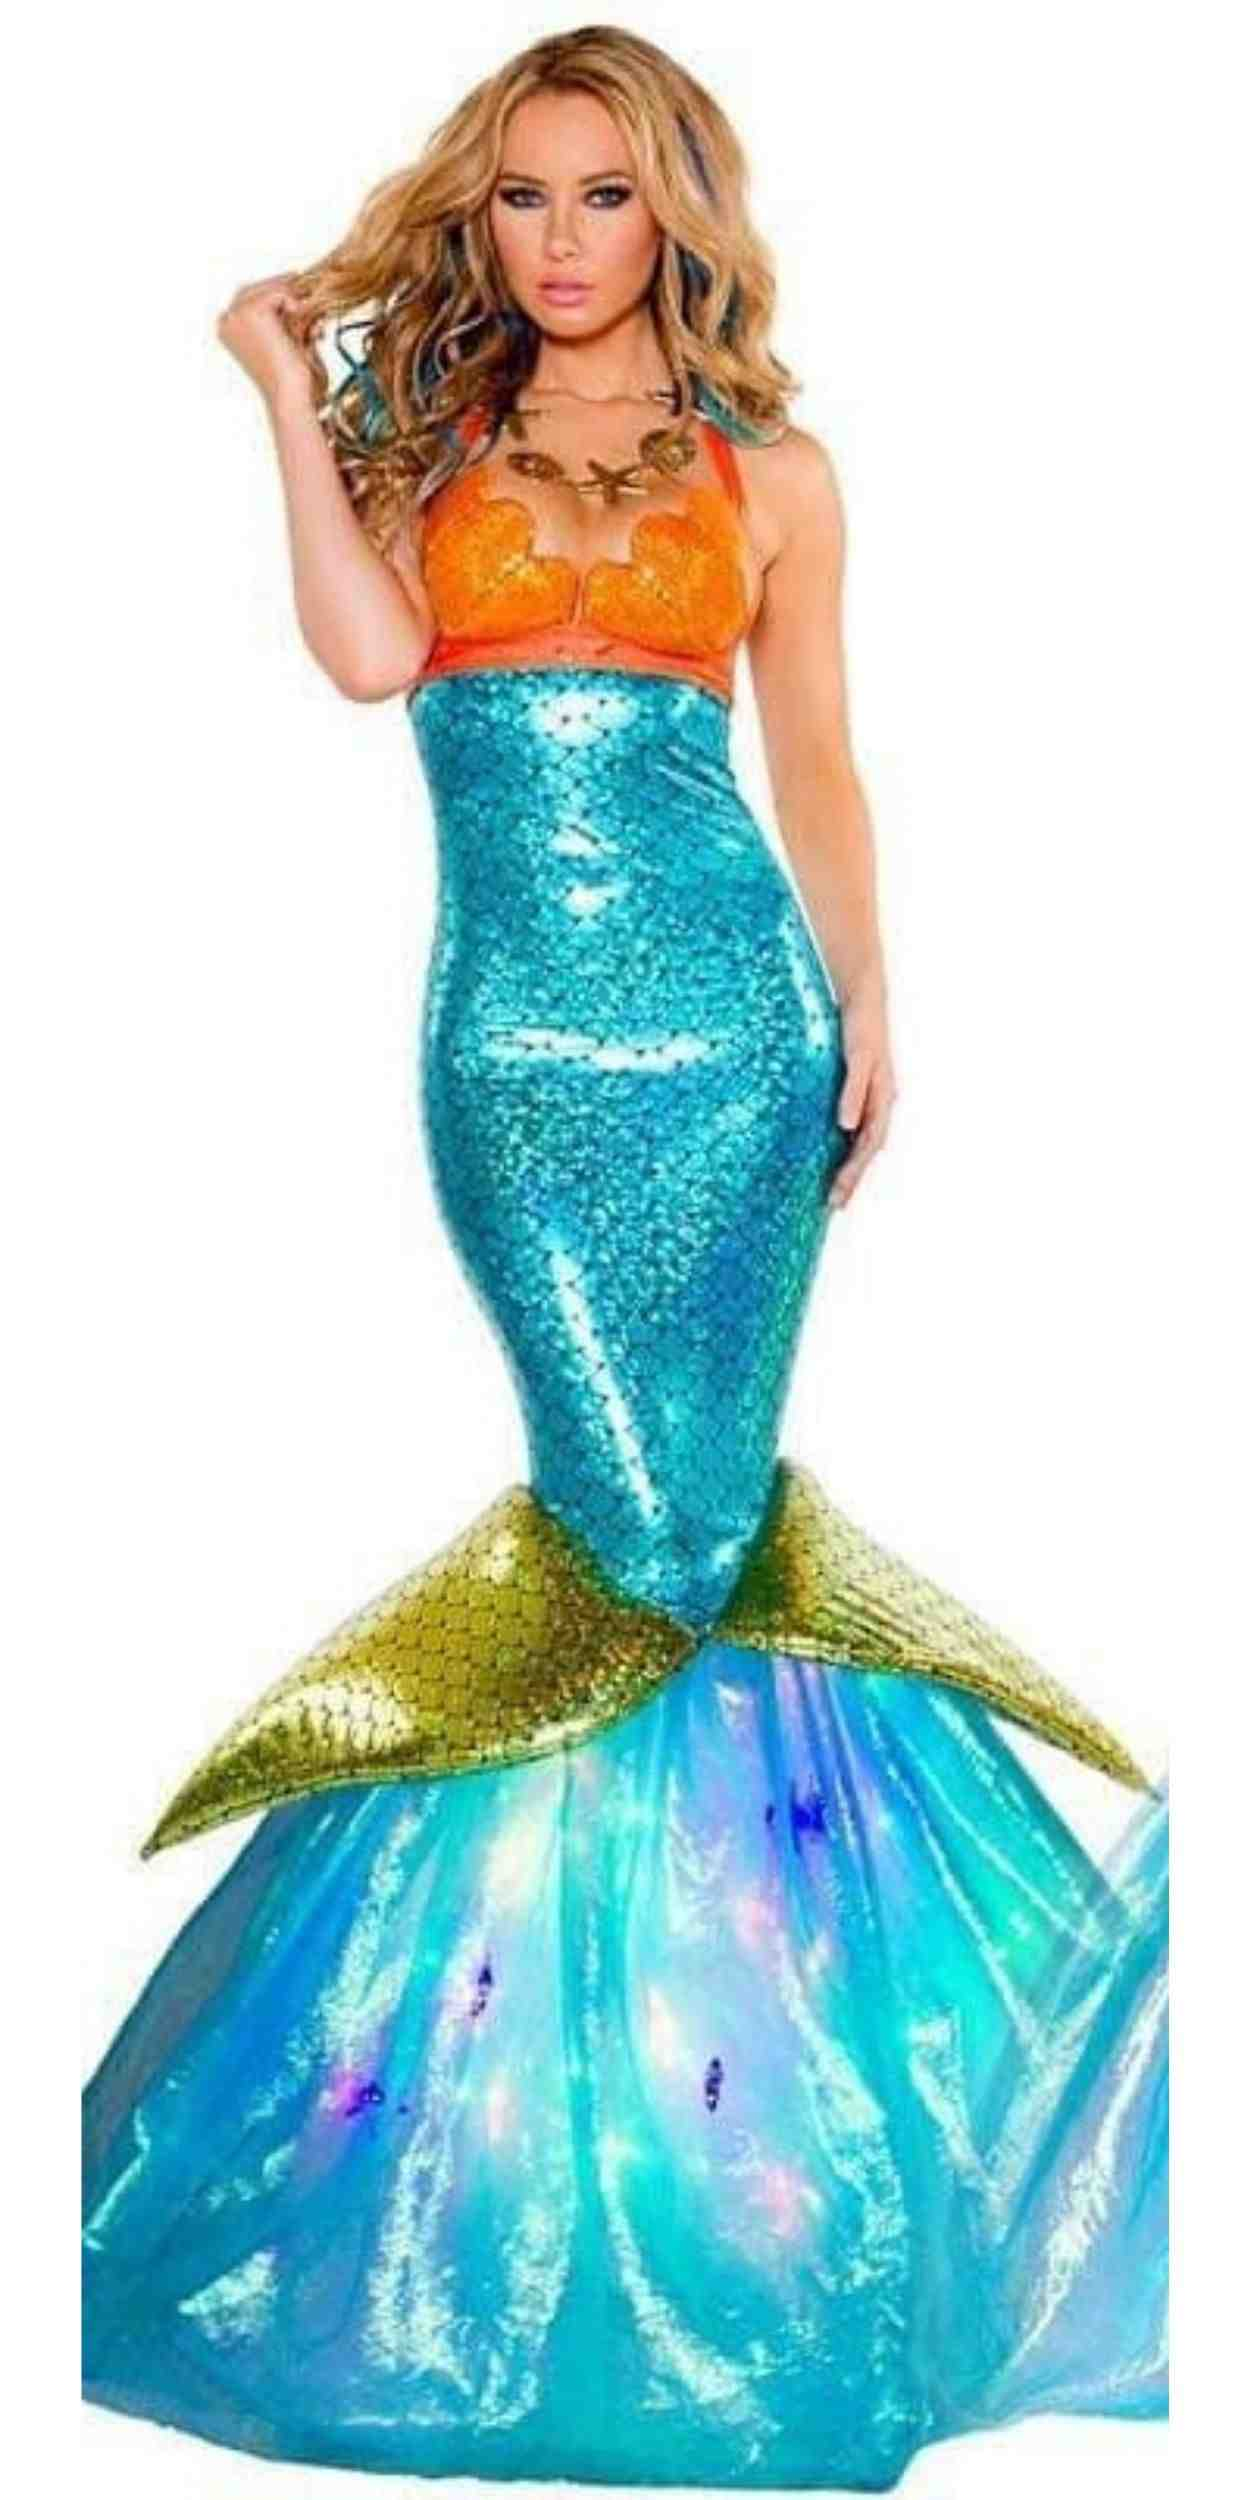 Woman in Mermaid Party Costume